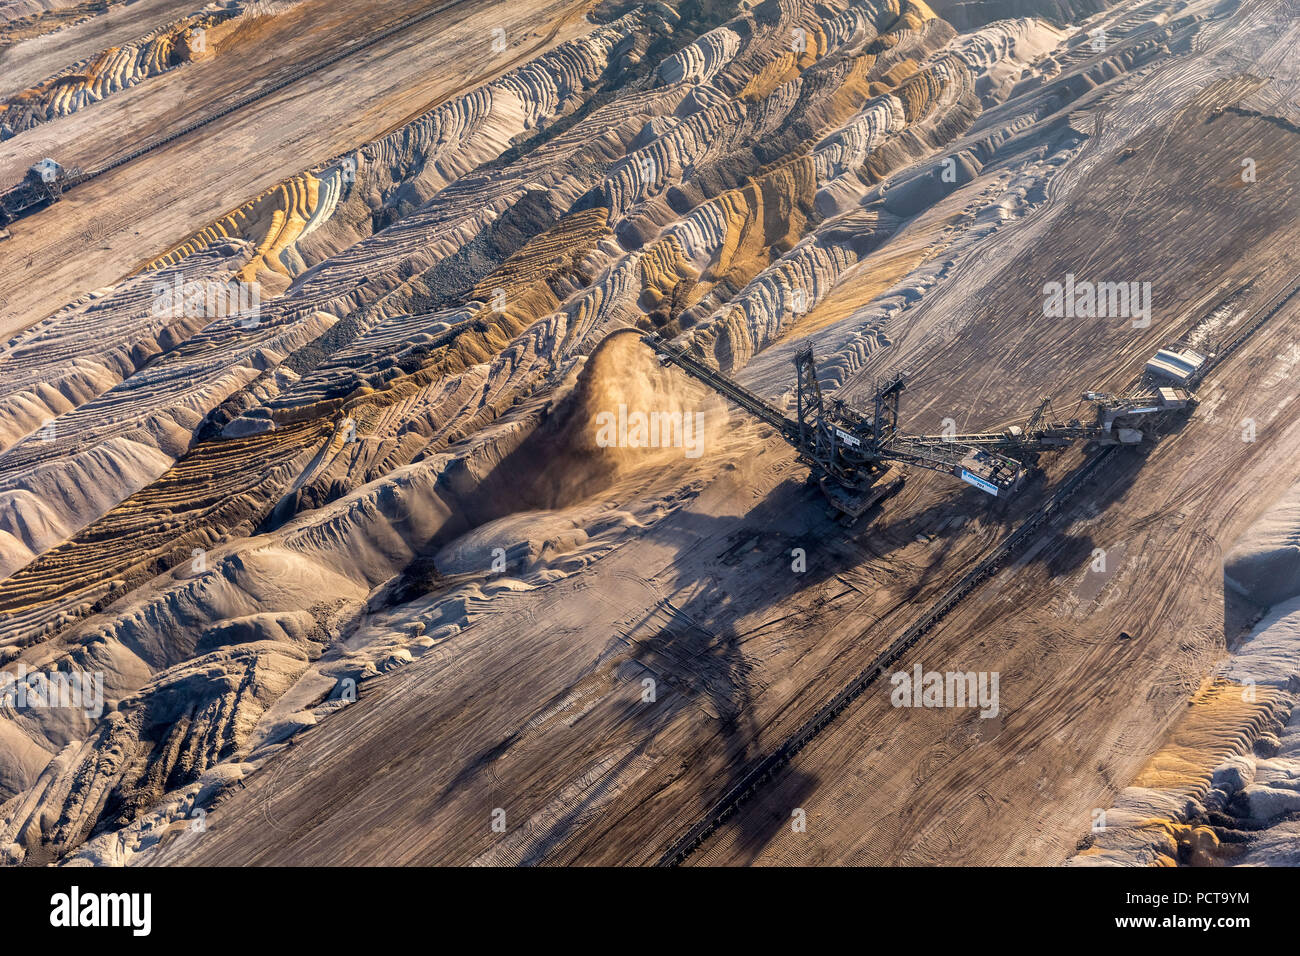 Hambach opencast mining, Hambach lignite mine, earth dumping, lignite excavator, Niederzier, Jülich-Zülpich Börde, North Rhine-Westphalia, Germany - Stock Image